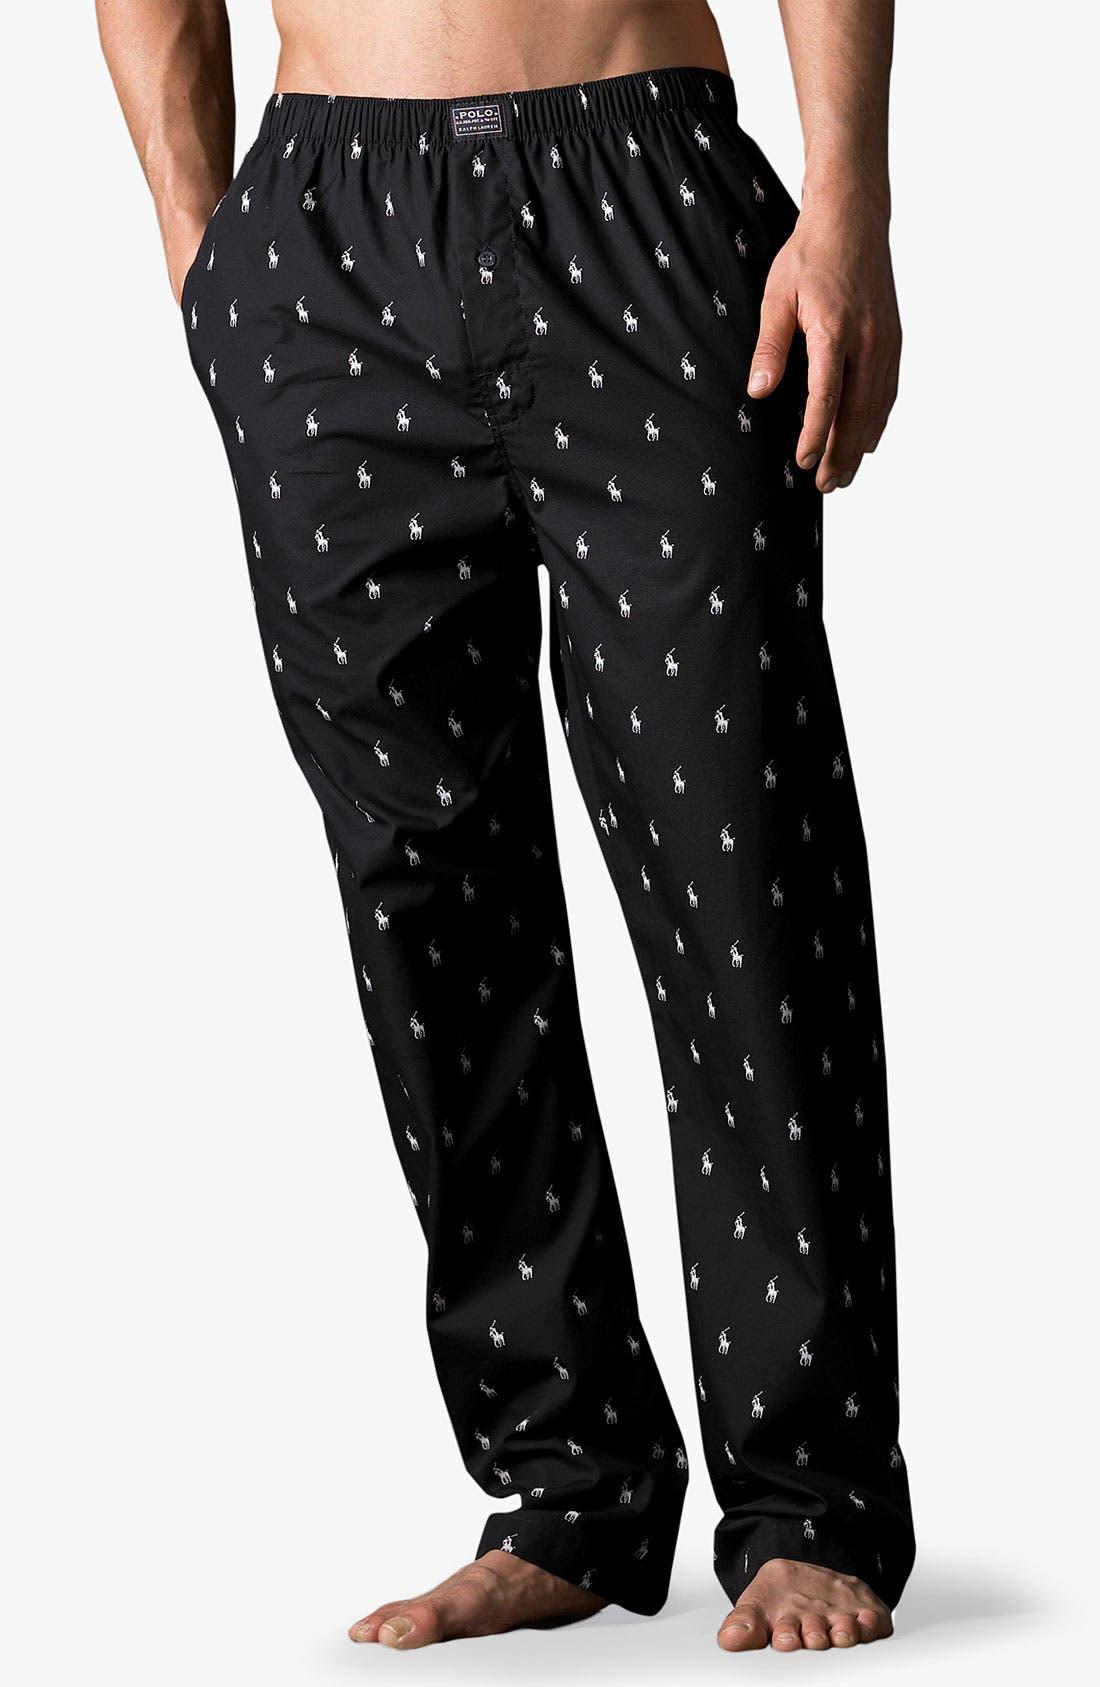 Alternate Image 1 Selected - Polo Ralph Lauren Print Lounge Pants (Tall)